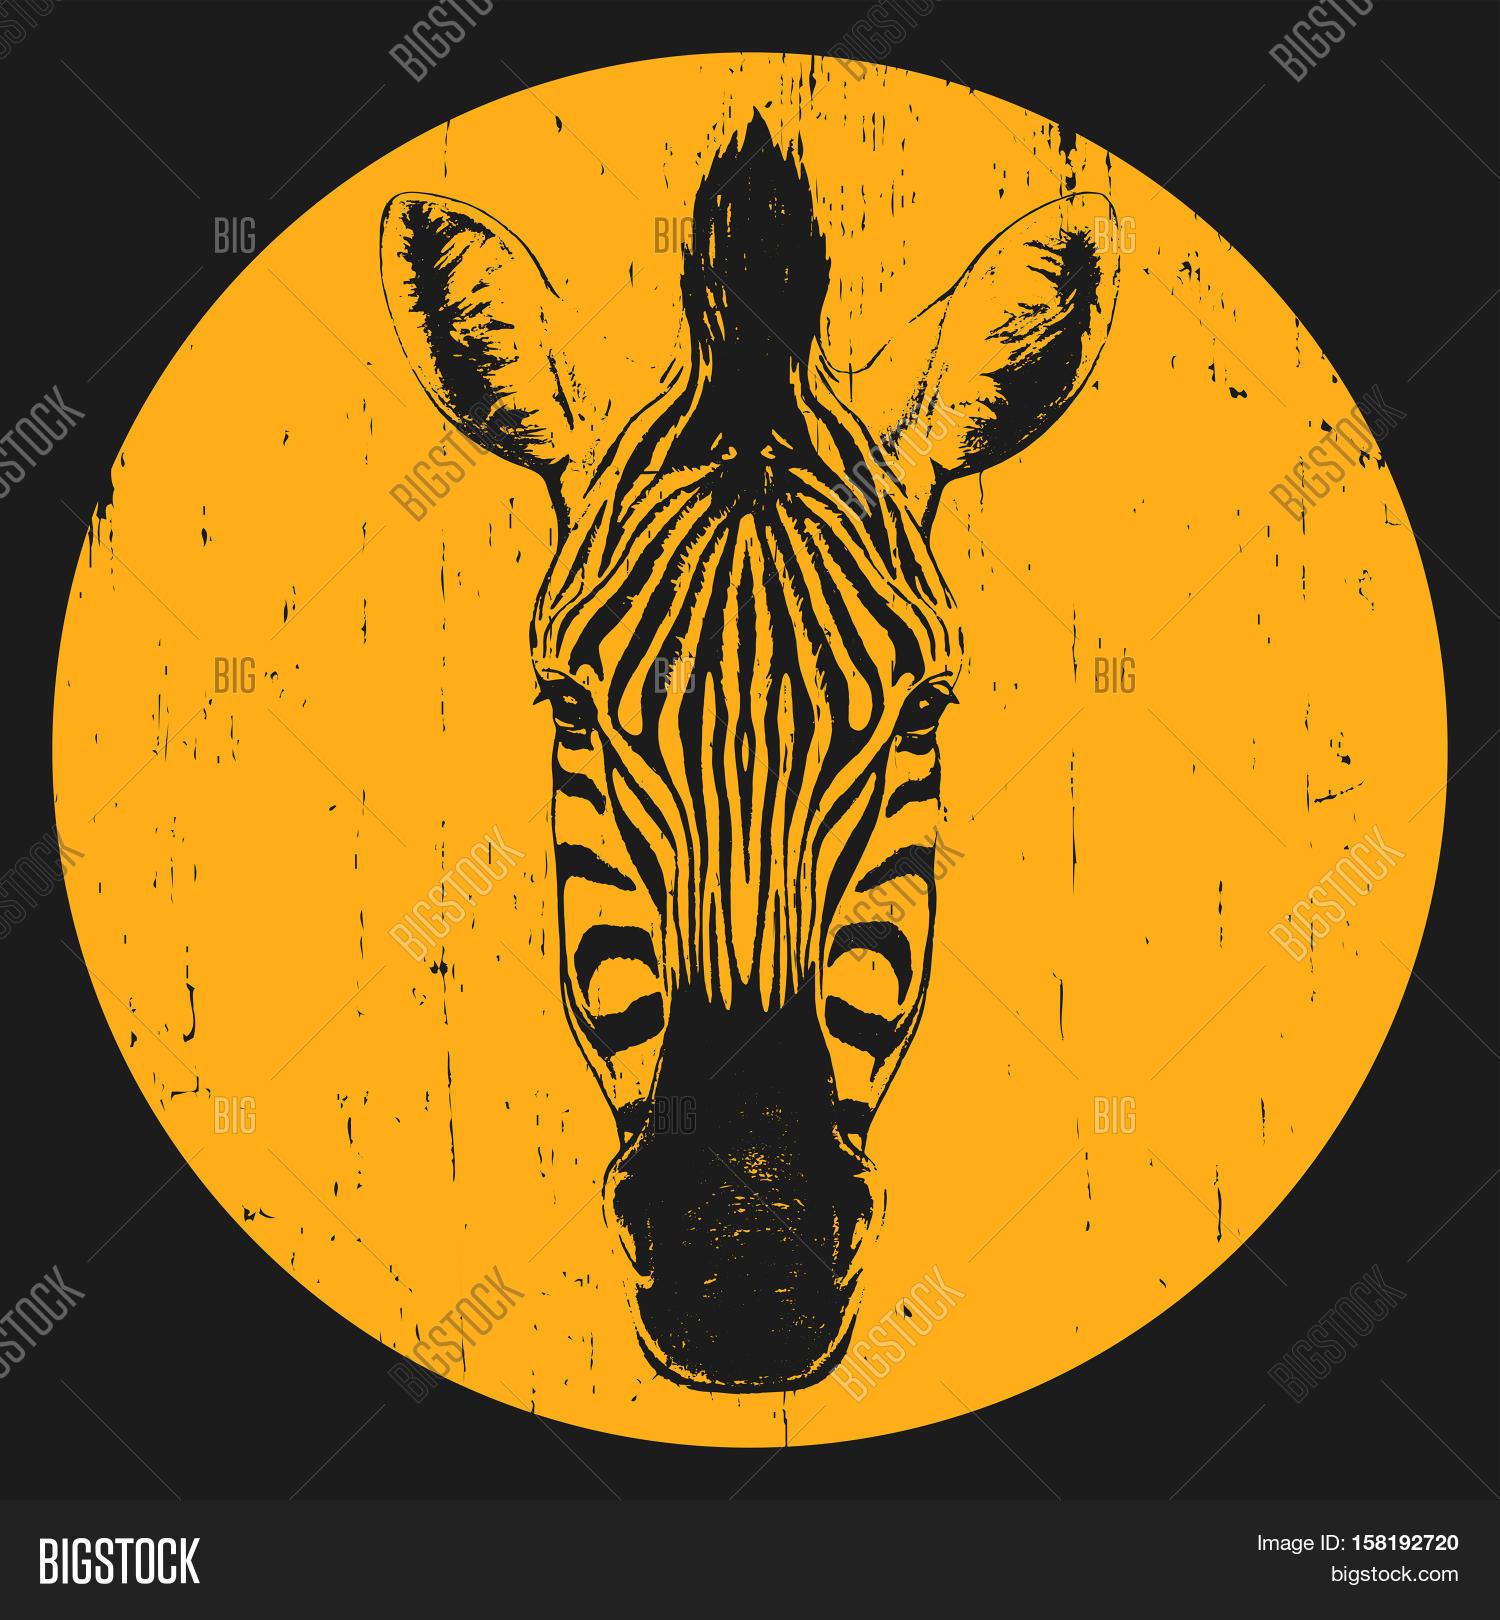 Zebra shirt design - Portrait Of Zebra Hand Drawn Illustration T Shirt Design Vector